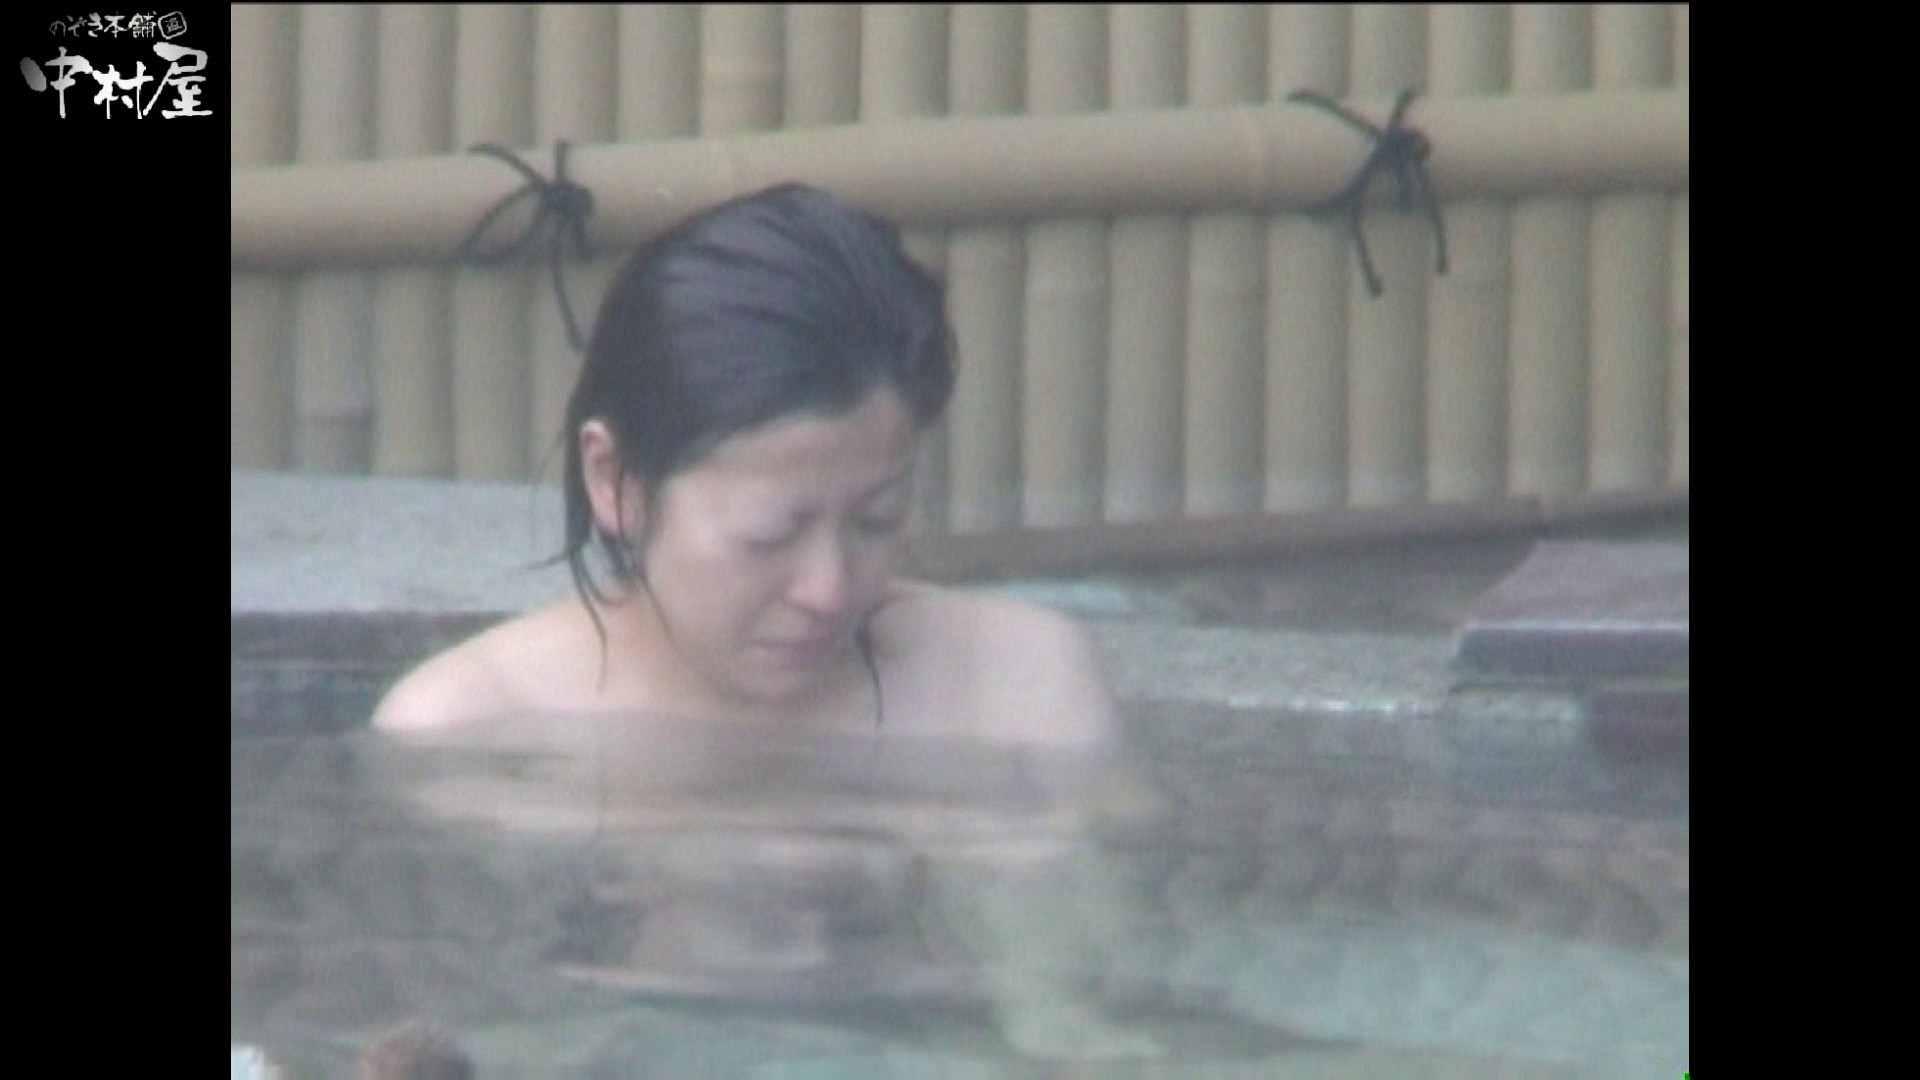 Aquaな露天風呂Vol.986 盗撮  94連発 36